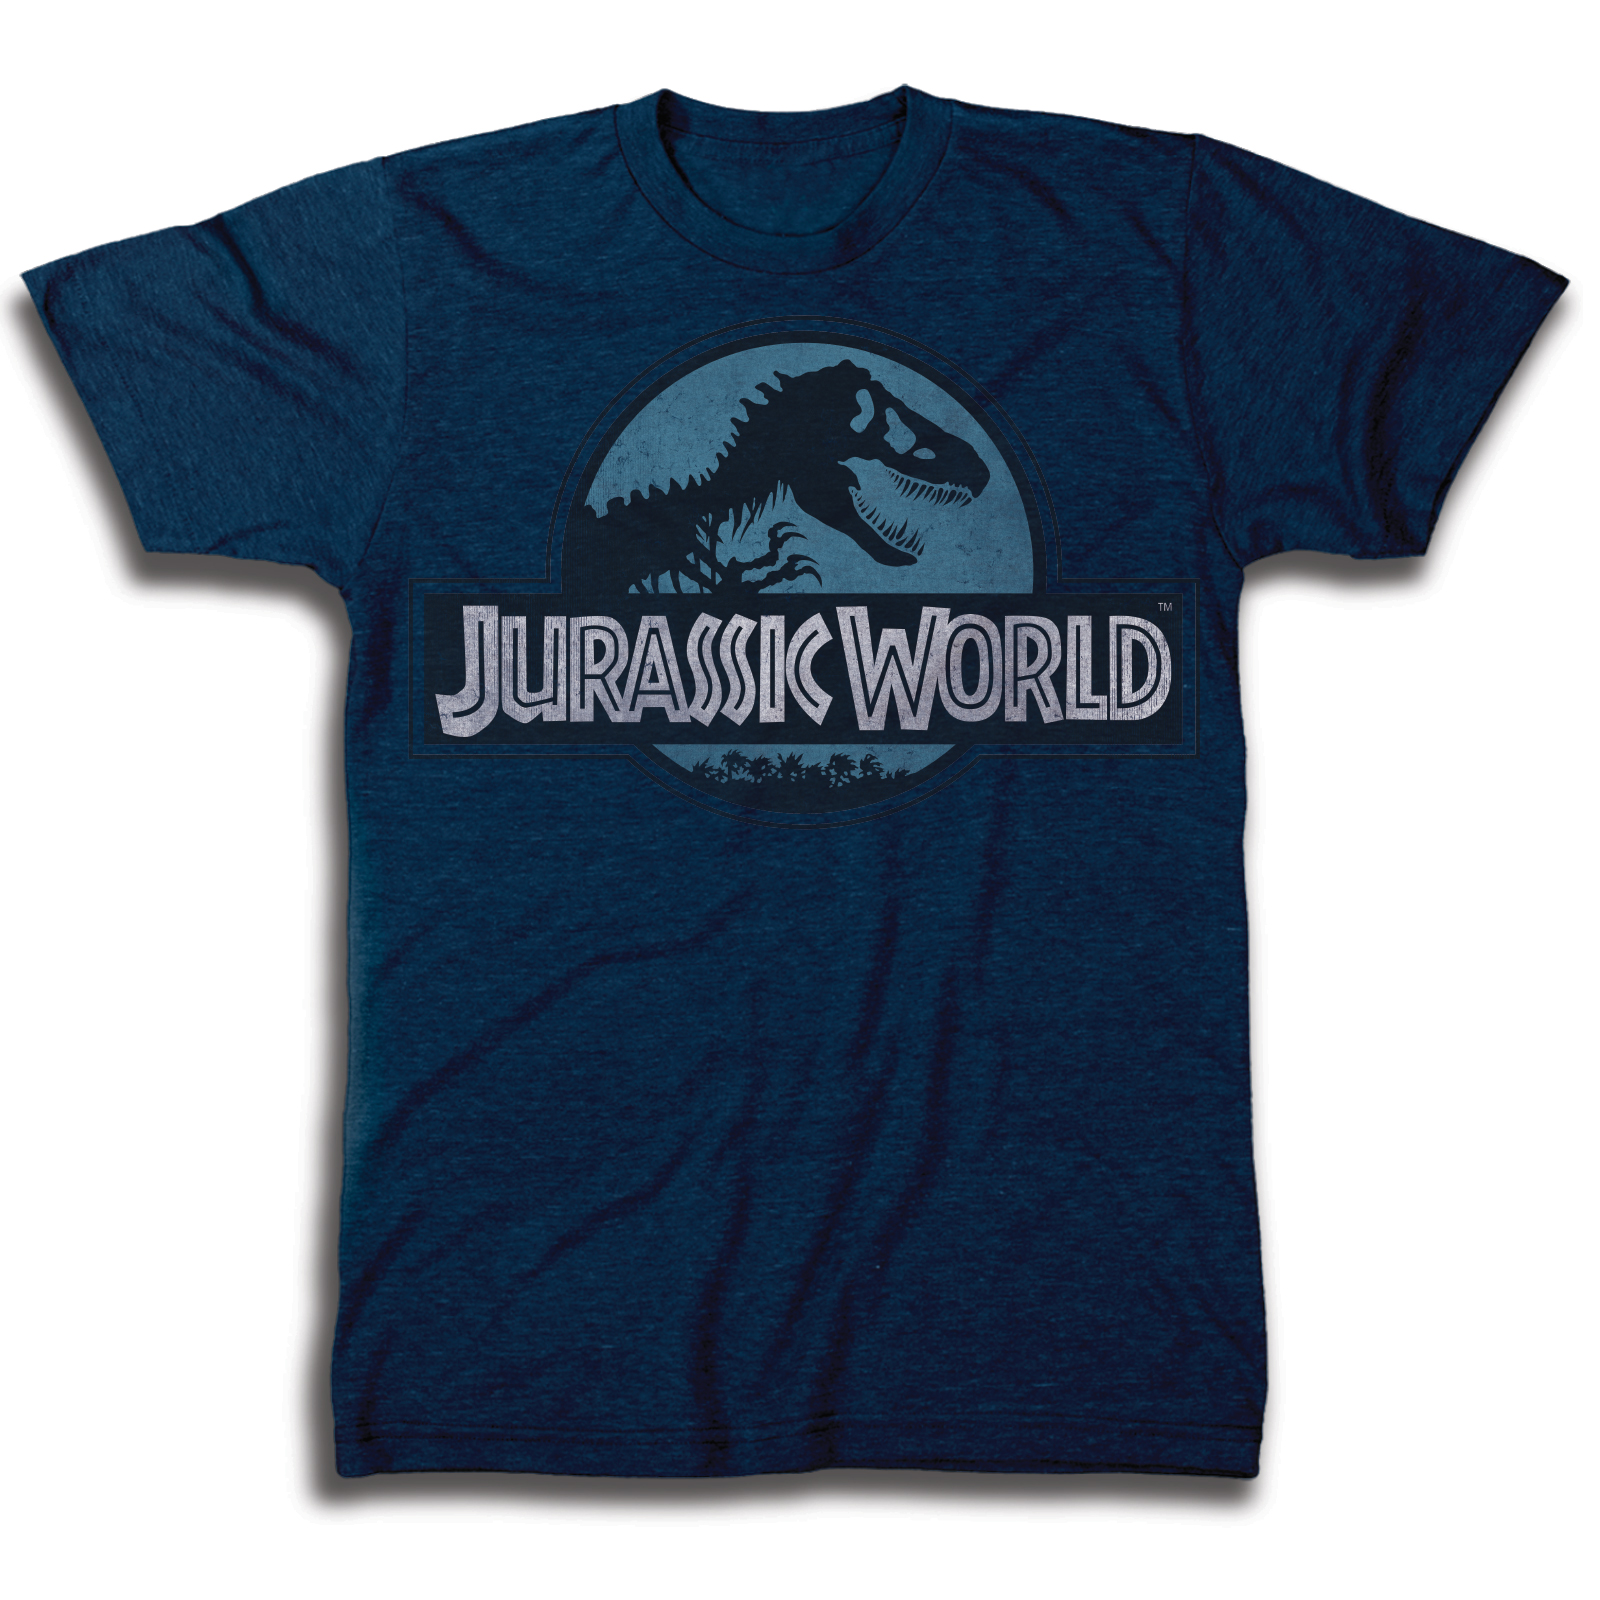 NBC Universal Jurassic World Logo Short Sleeve T-Shirt PartNumber: 3ZZVA86690412P MfgPartNumber: JKSN006-18